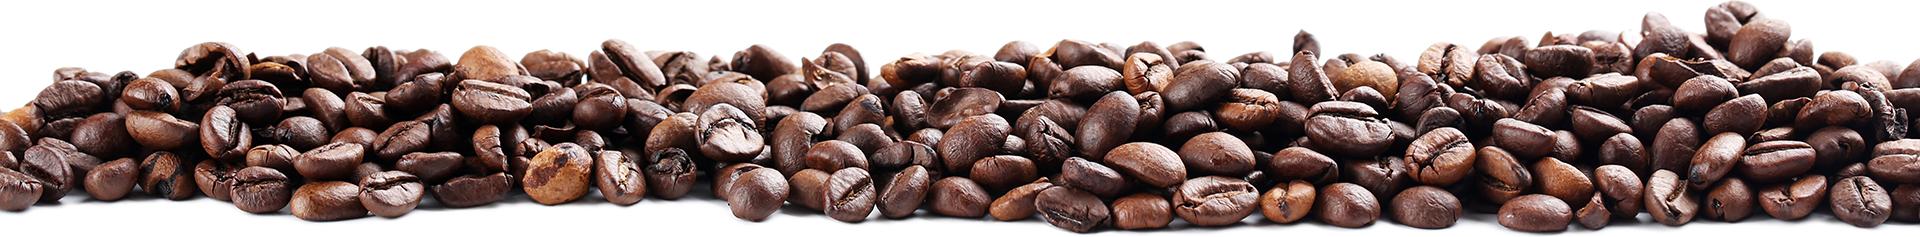 Resultado de imagen para granos de cafe PNG